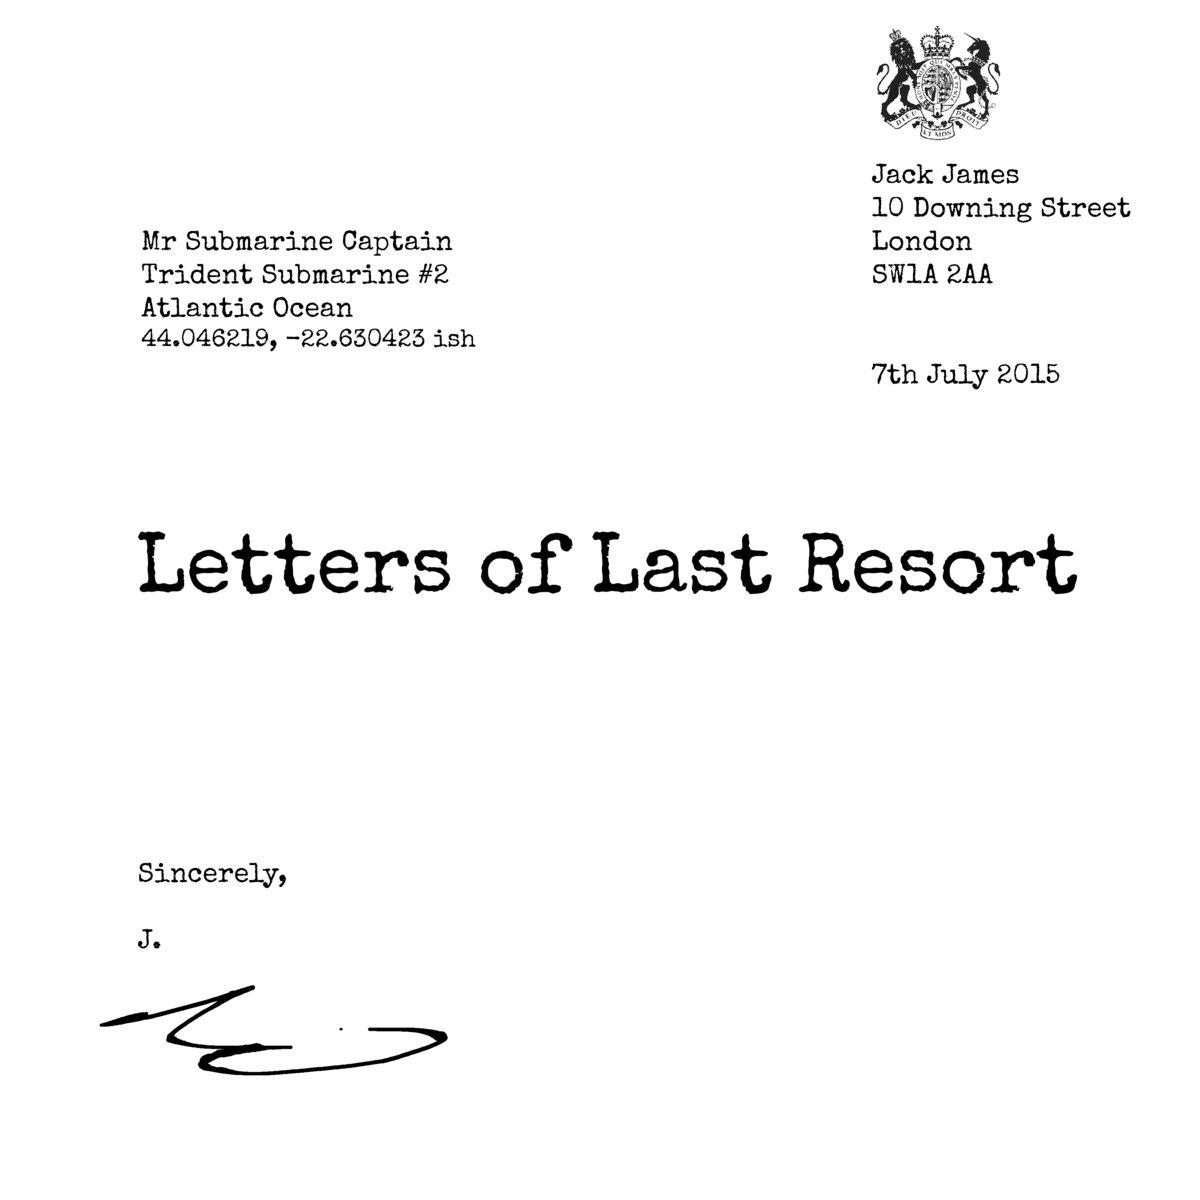 Letters of Last Resort